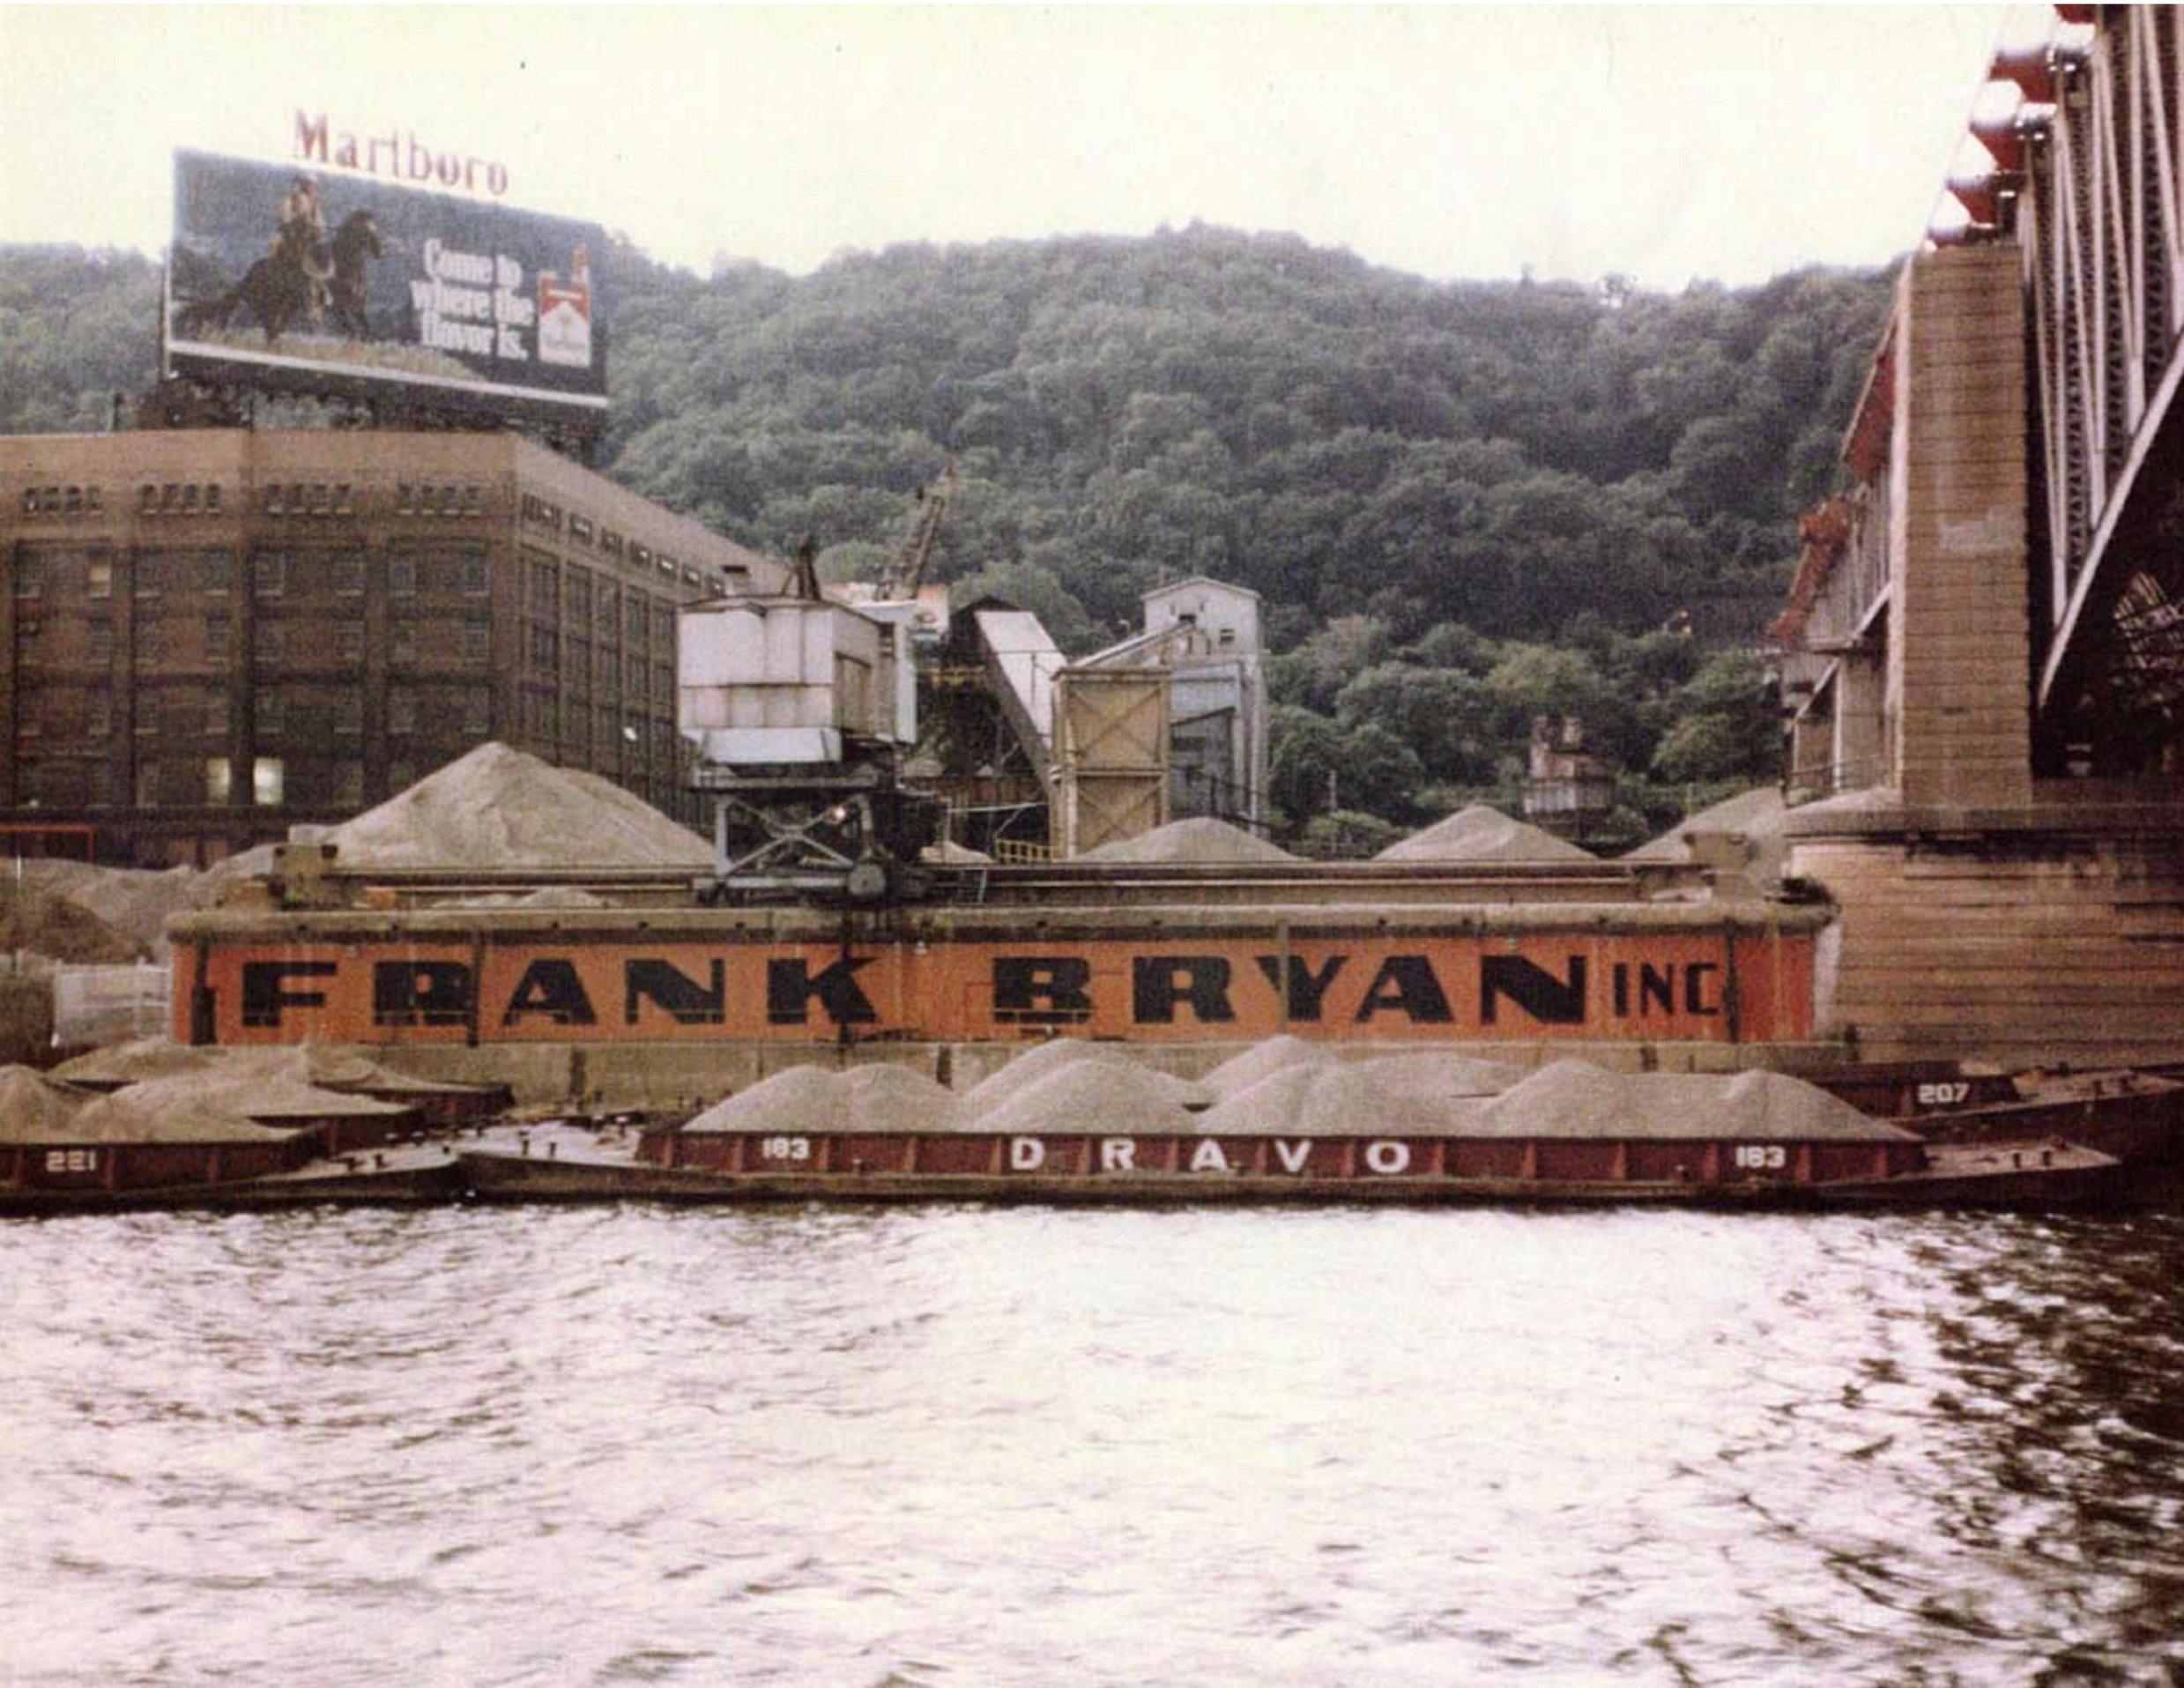 South Side River Landing - 1980s